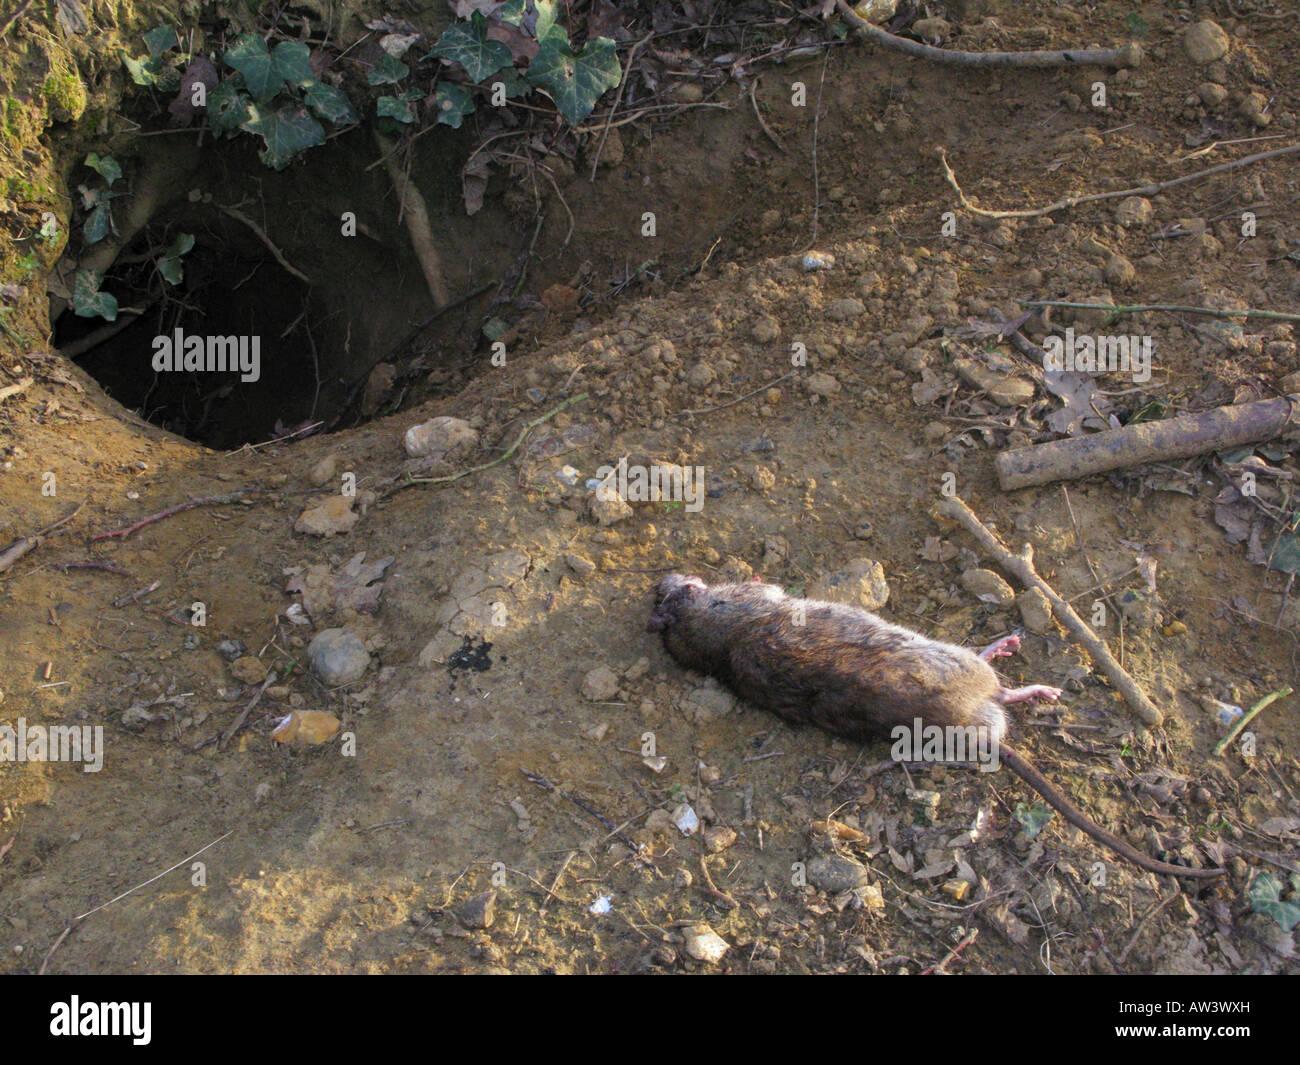 dead-brown-rat-at-entrance-of-fox-hole-den-rattus-norvegicus-AW3WXH.jpg